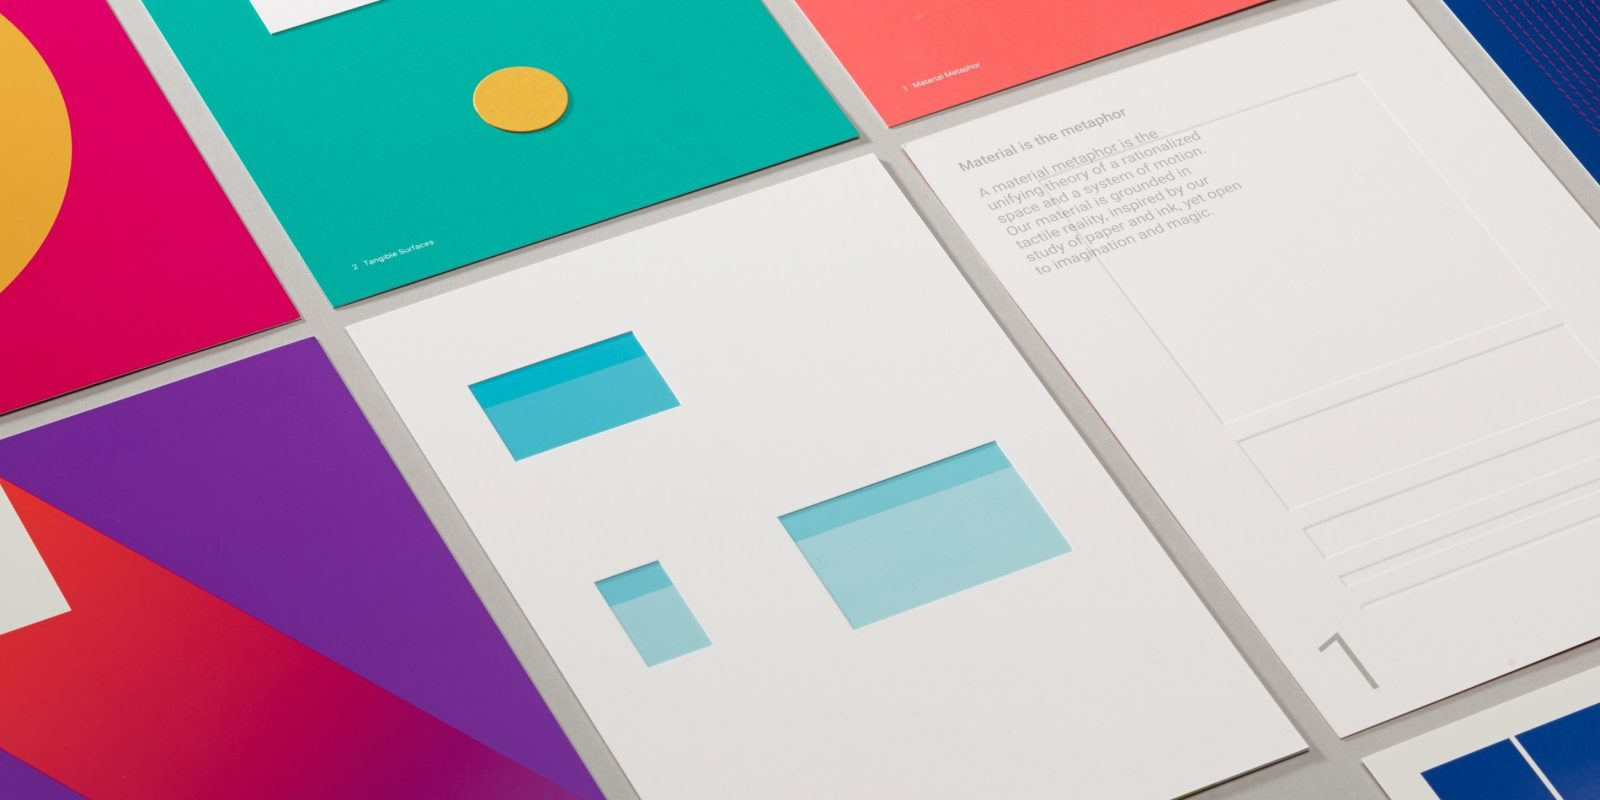 Primi passi con Material Design 1